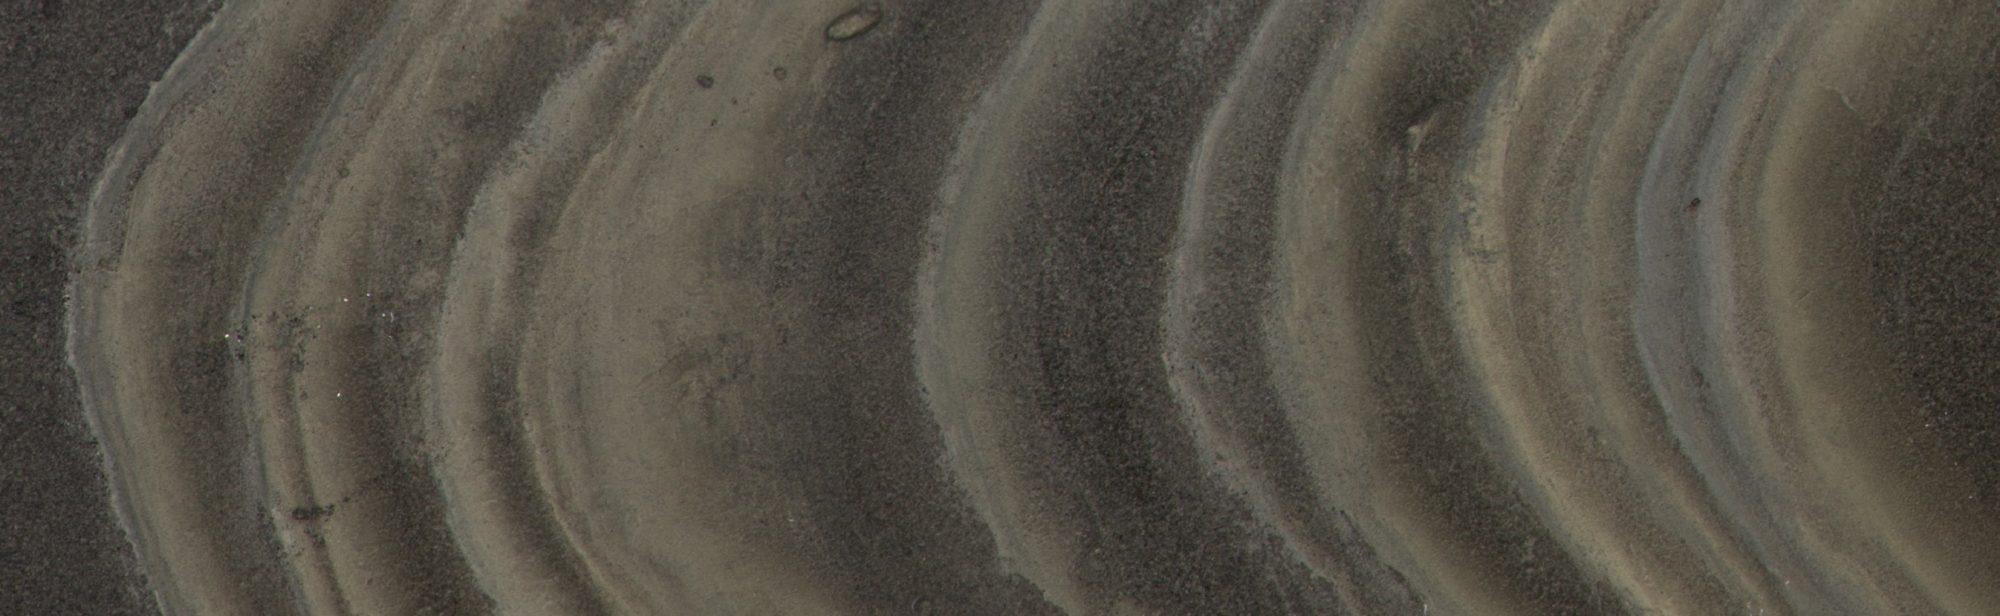 Sedimentary Records of Environmental Change Lab